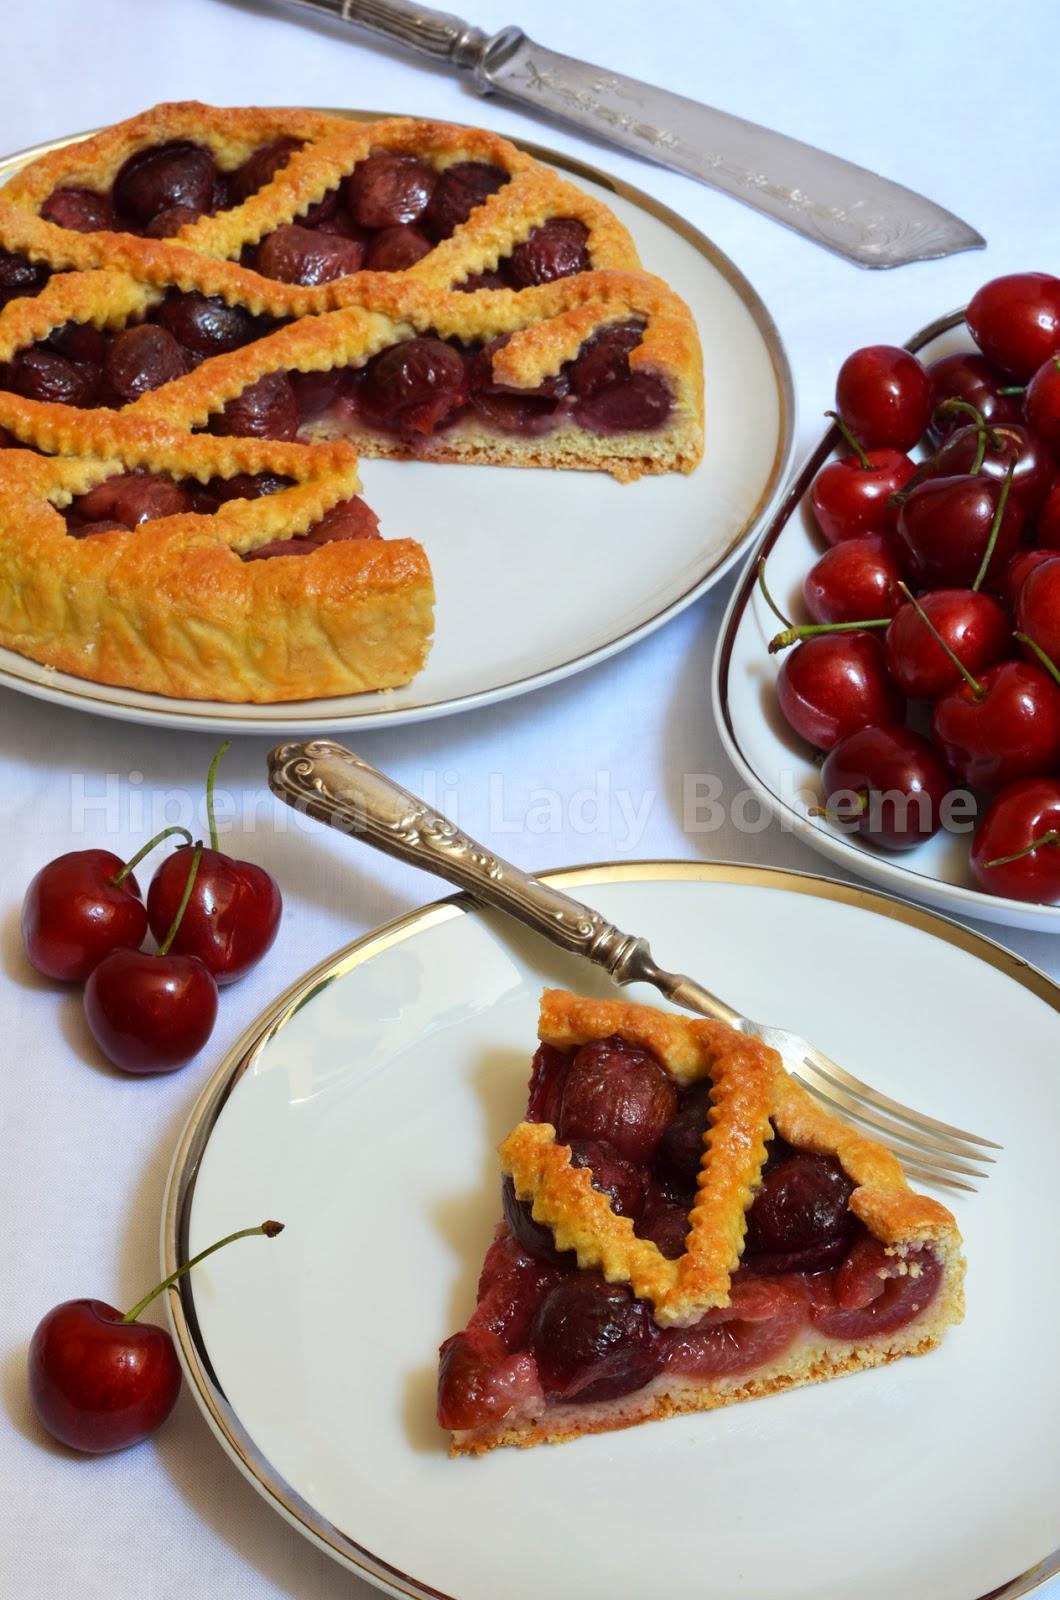 hiperica_lady_boheme_blog_cucina_ricette_gustose_facili_veloci_crostata_di_ciliegie_fresche_2